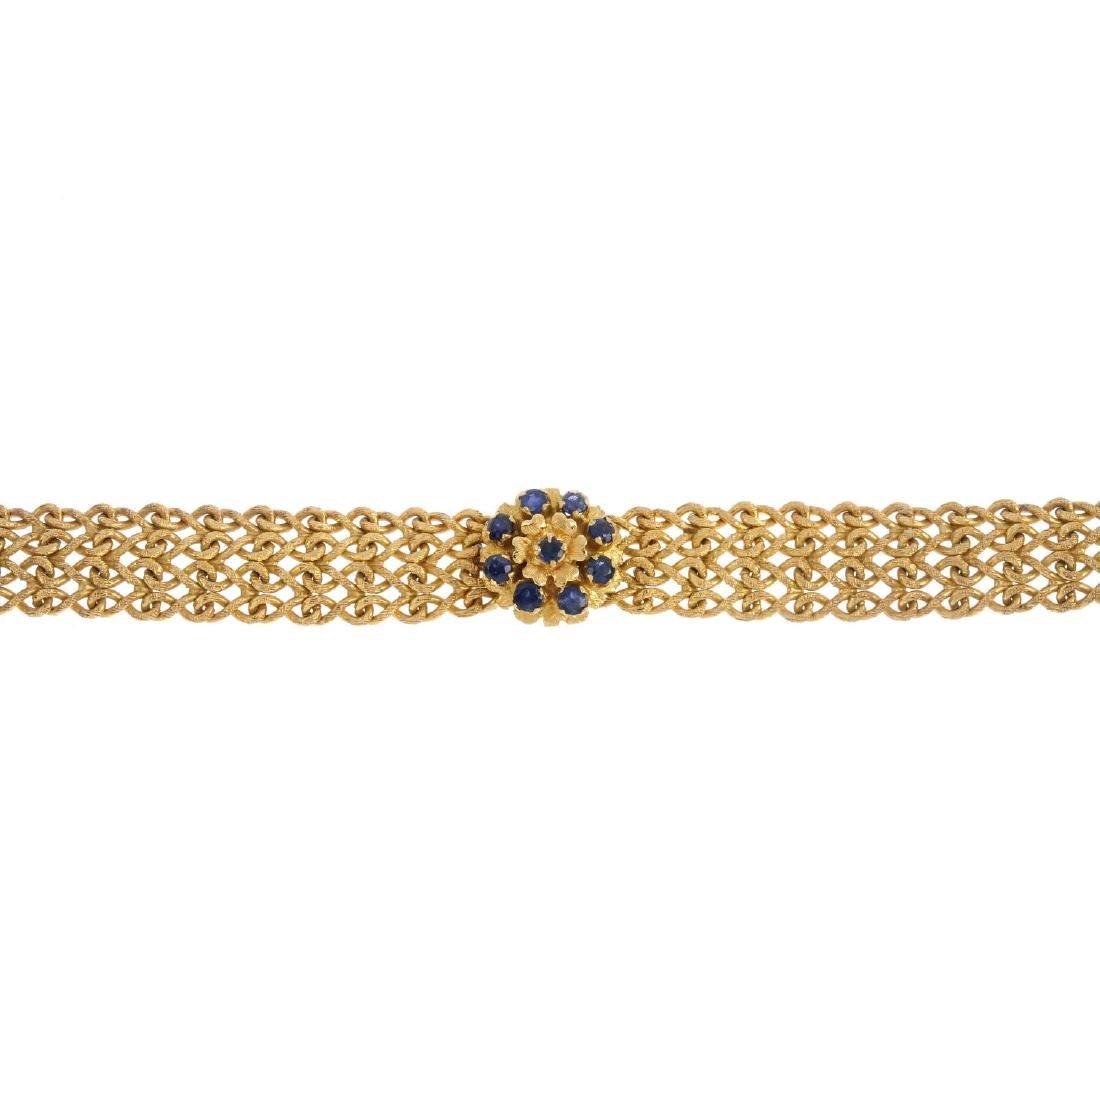 A sapphire bracelet. The circular-shape sapphire accent